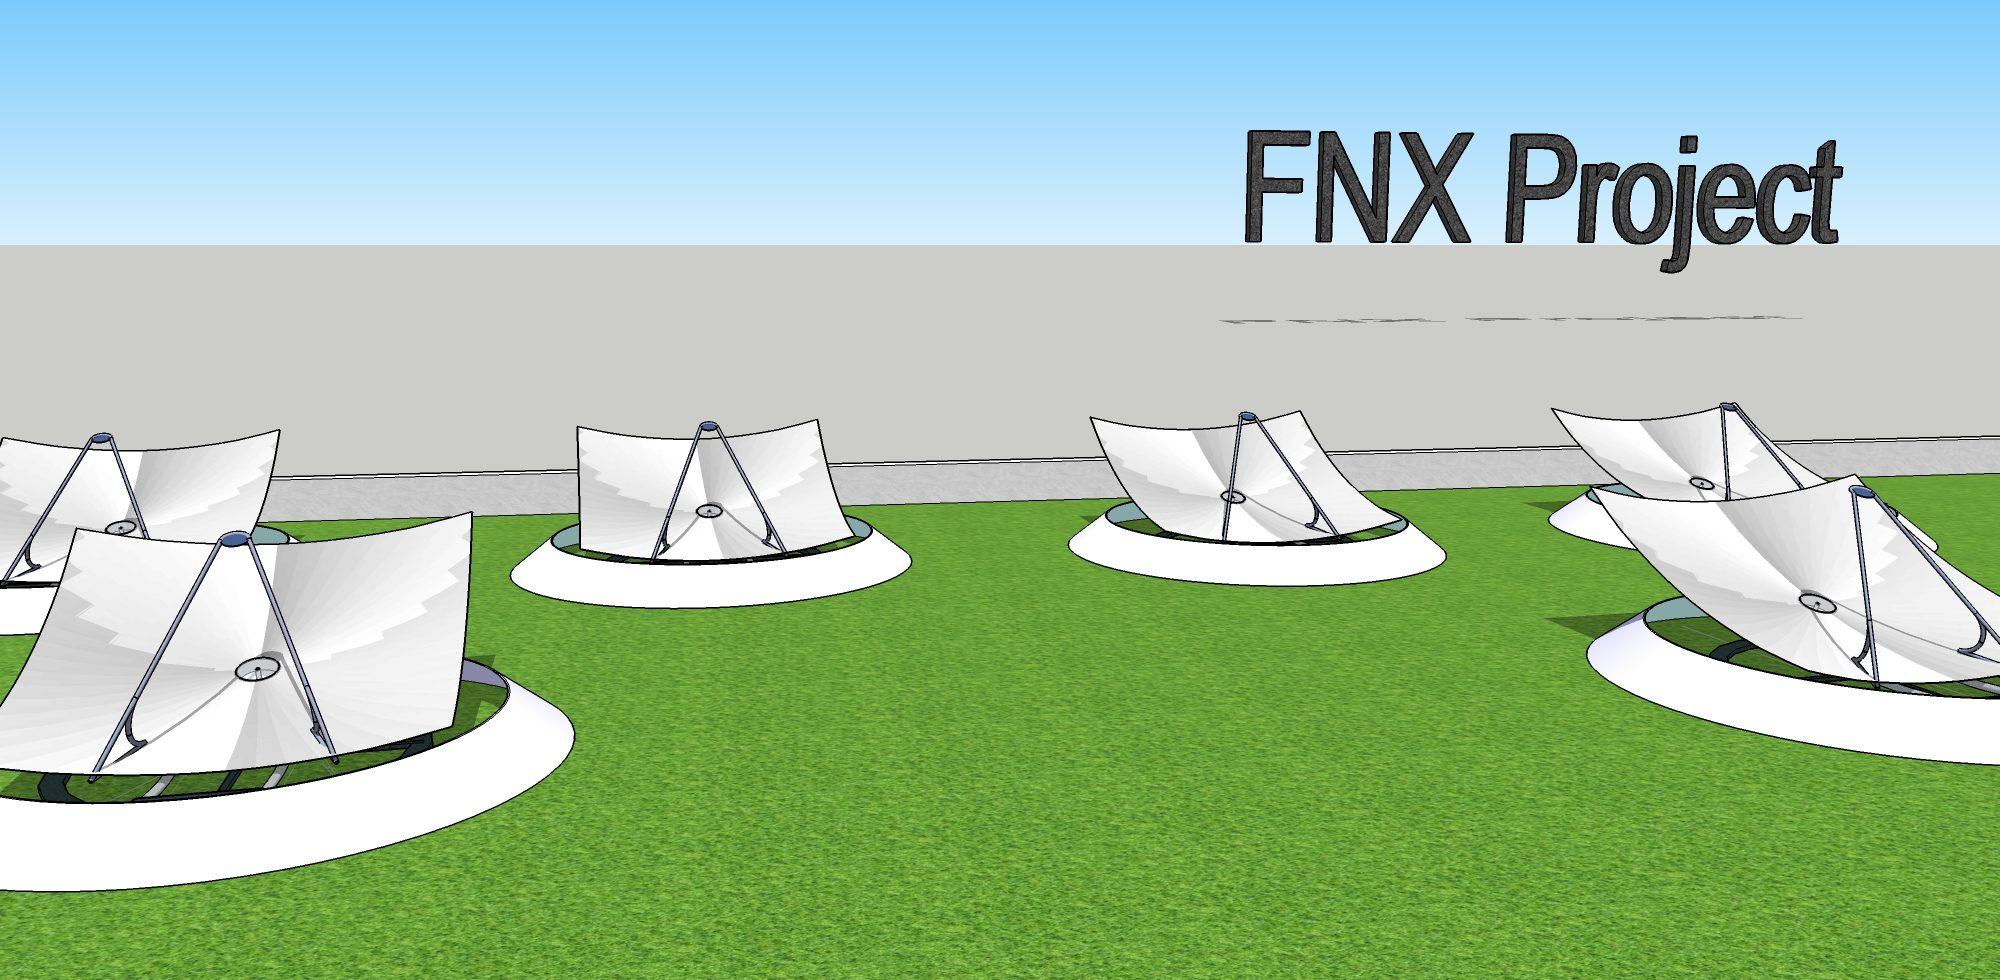 FNX Project